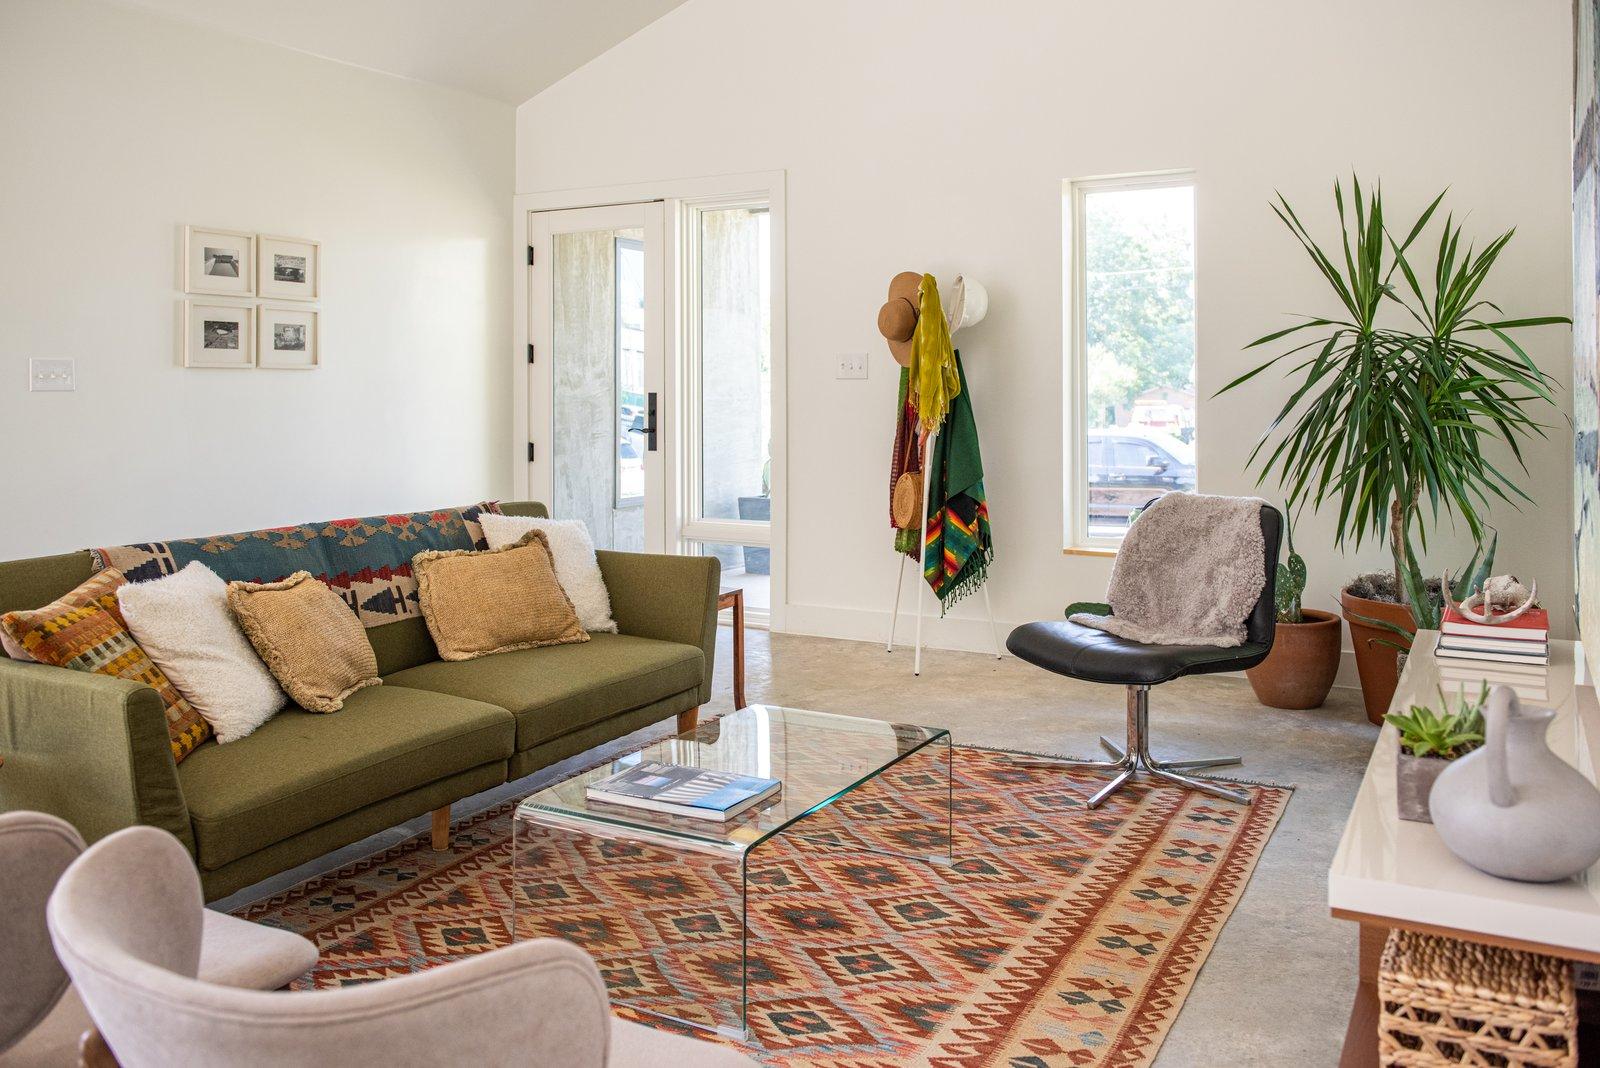 Living room of Haciendas house by Lake Flato